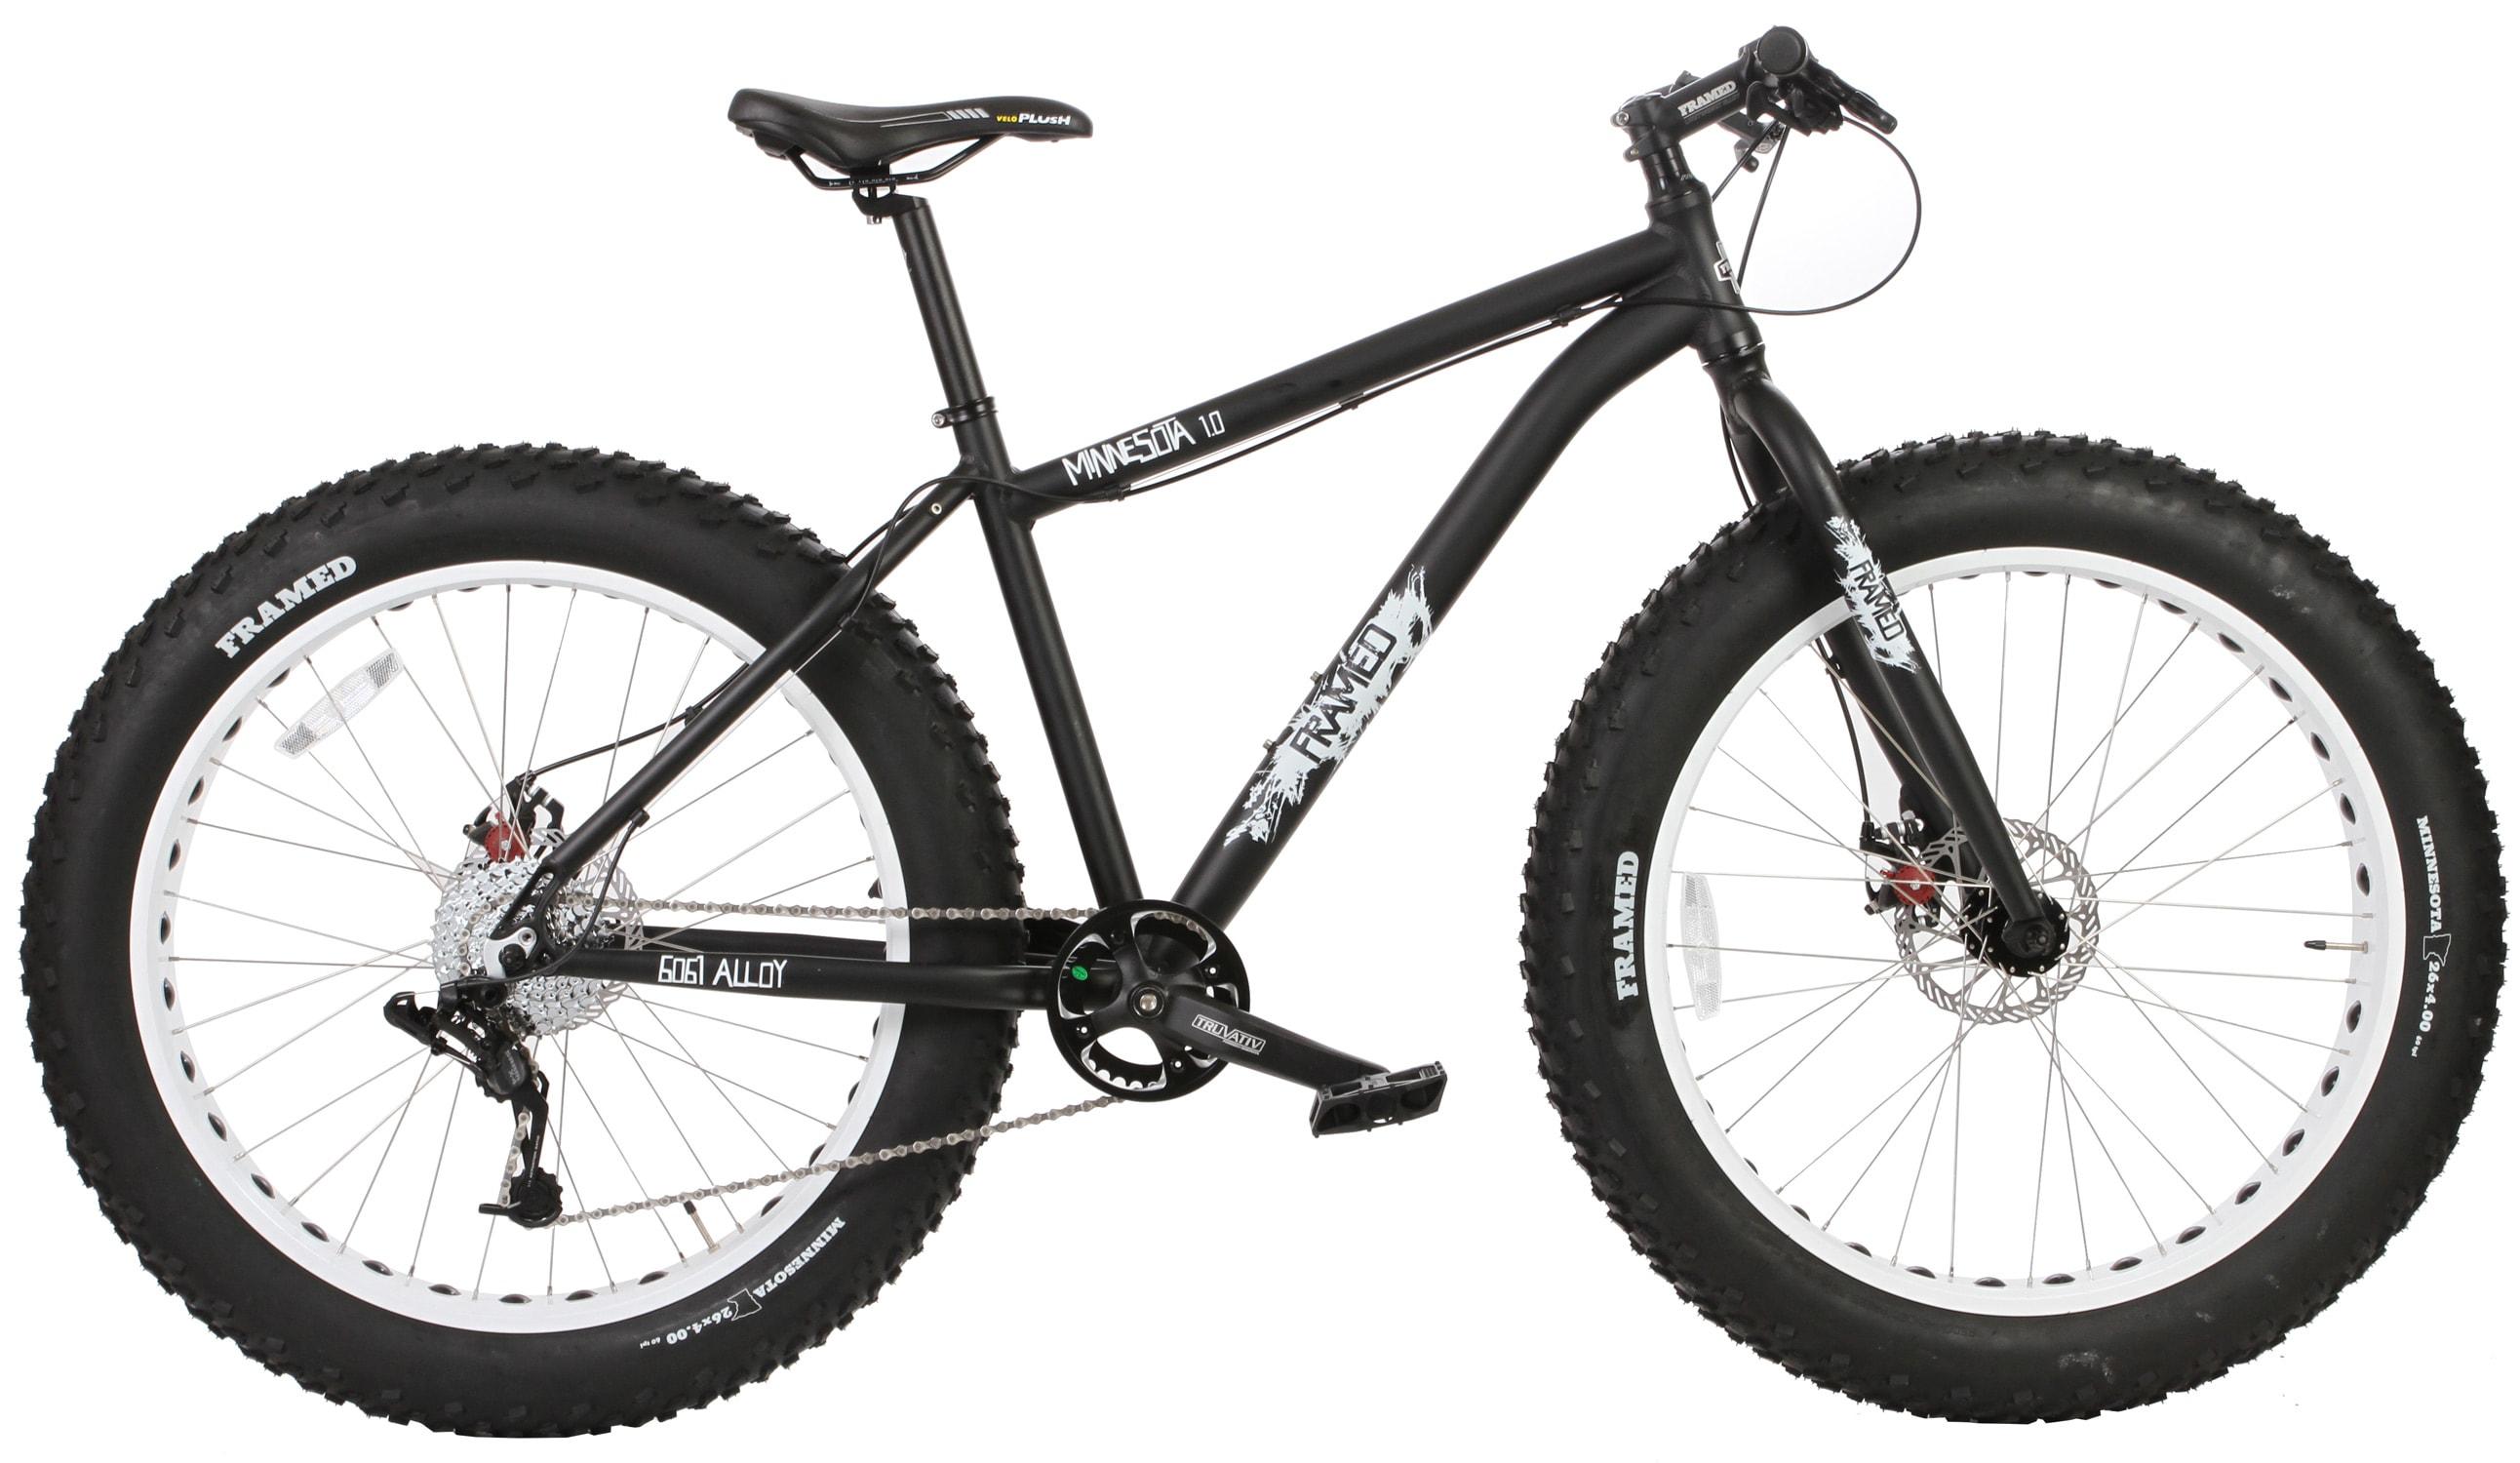 2 X Bike Hose ideal Fat Bike 2 X Tyre Covers Tyre 26 x 4.00